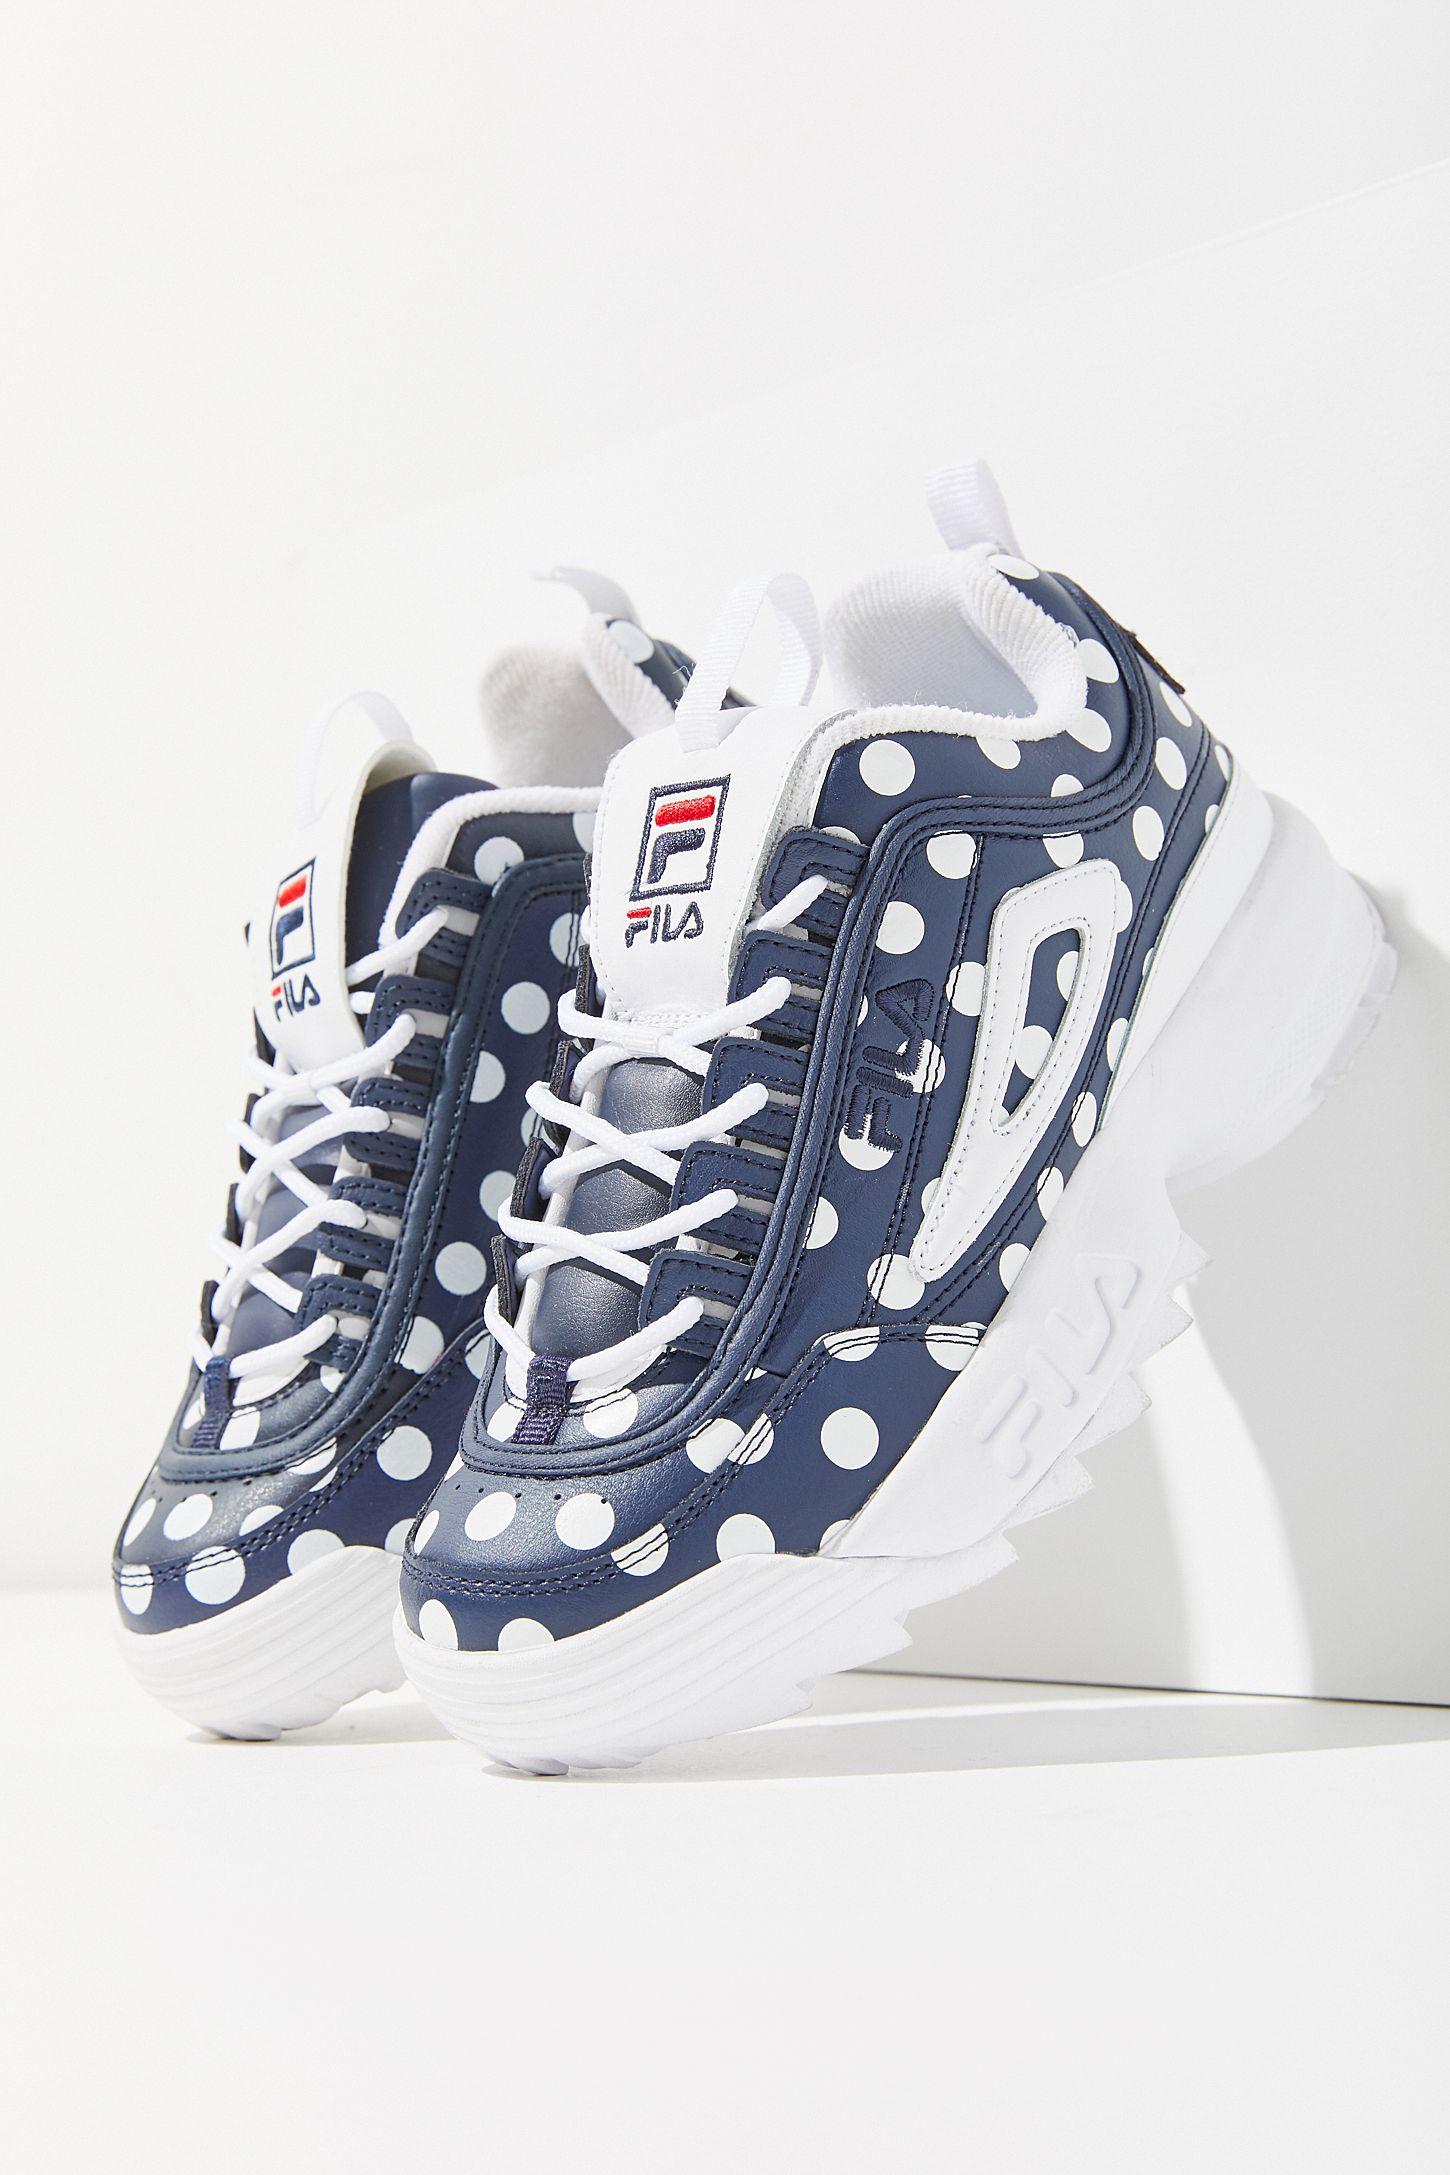 Dot 2 Polka Exclusive Fila Uo Sneaker Disruptor Pierre Cardin wqx6zT0